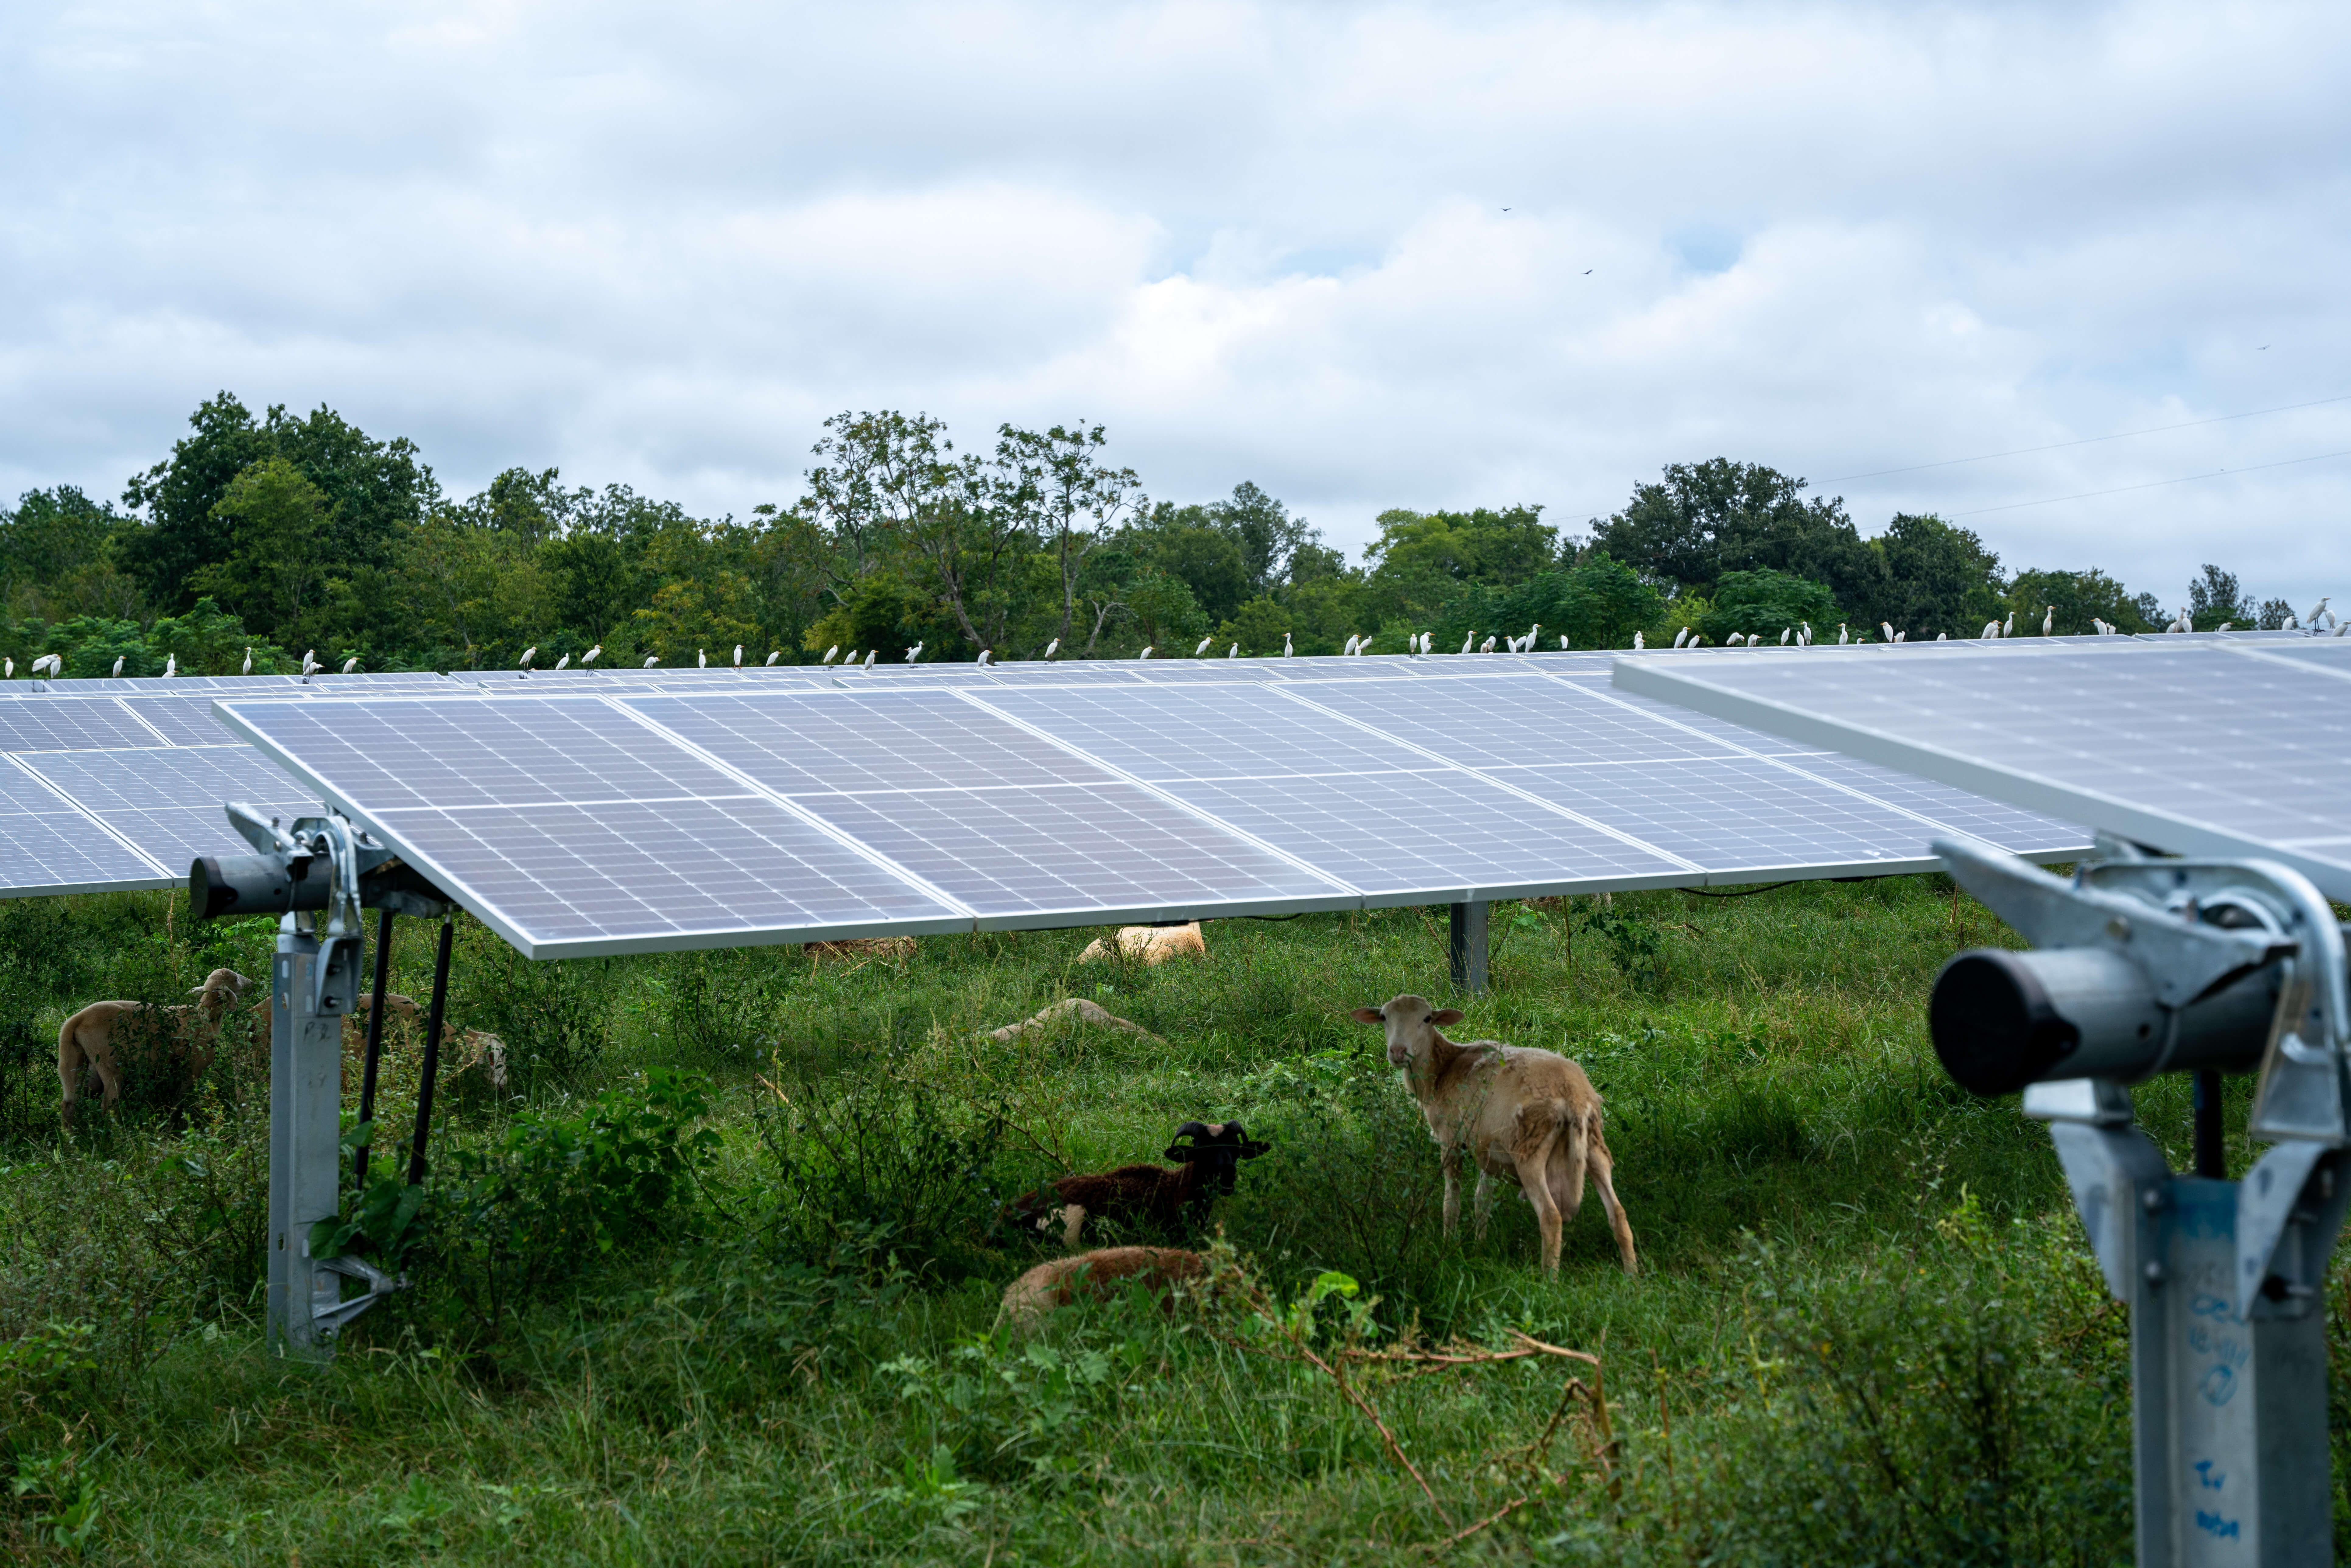 Managed grazing solar farm sheep